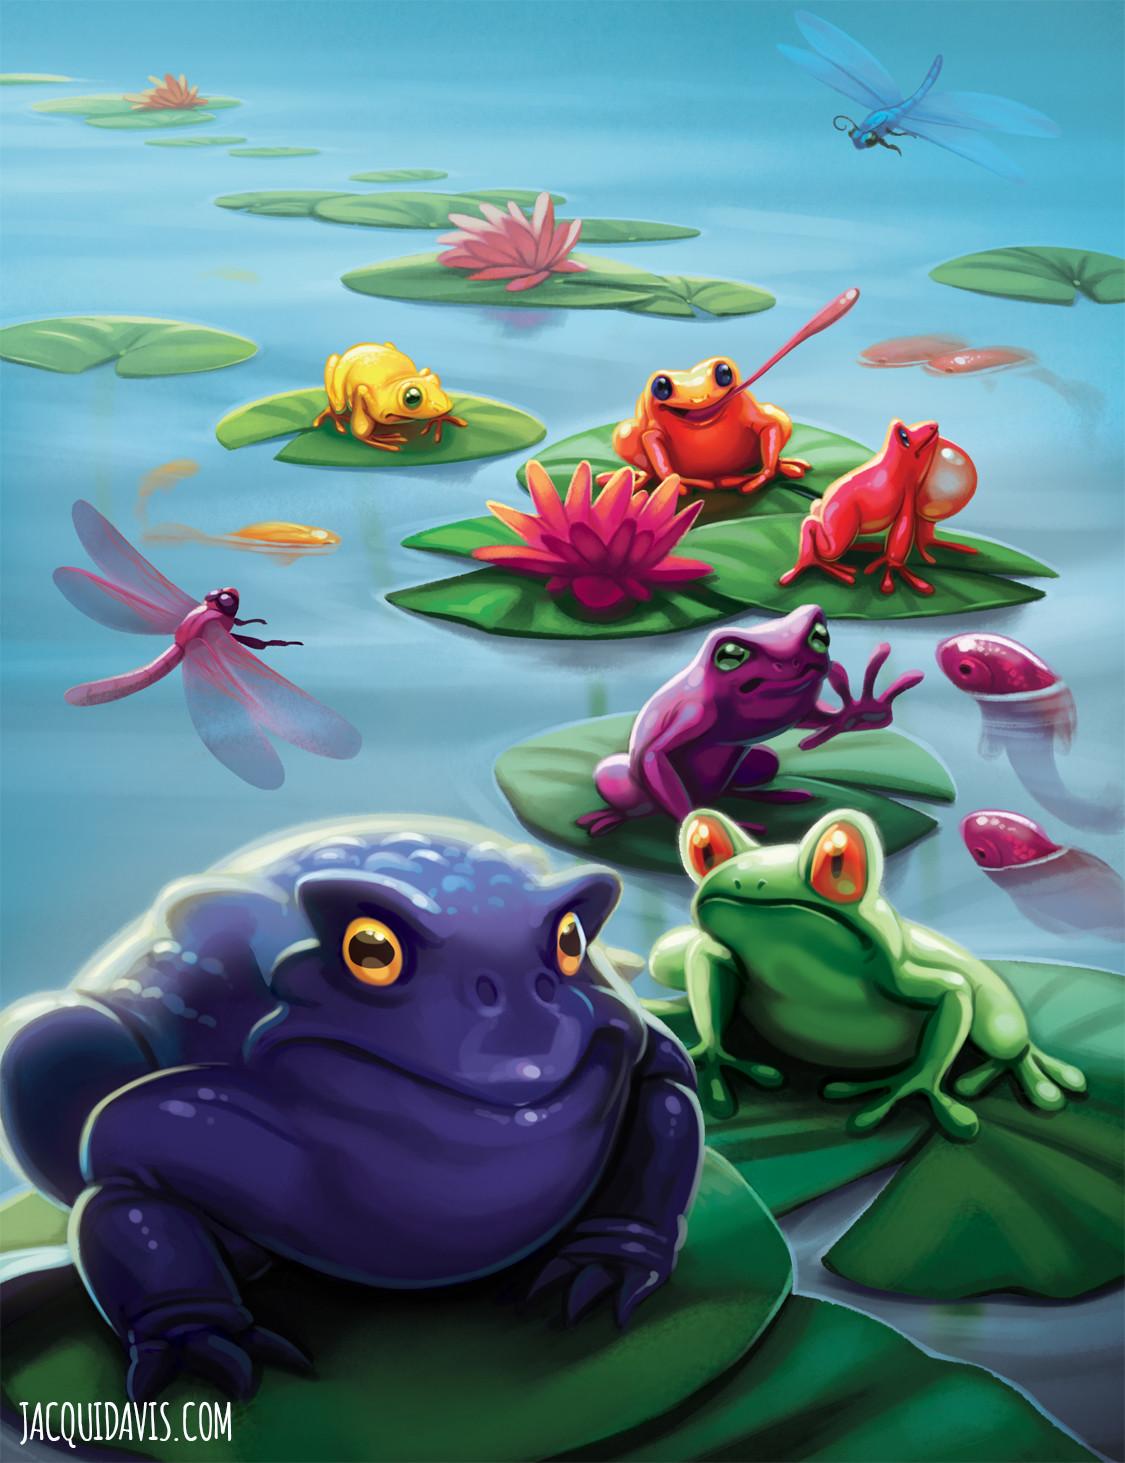 Jacqui davis bullfrogs cover copy